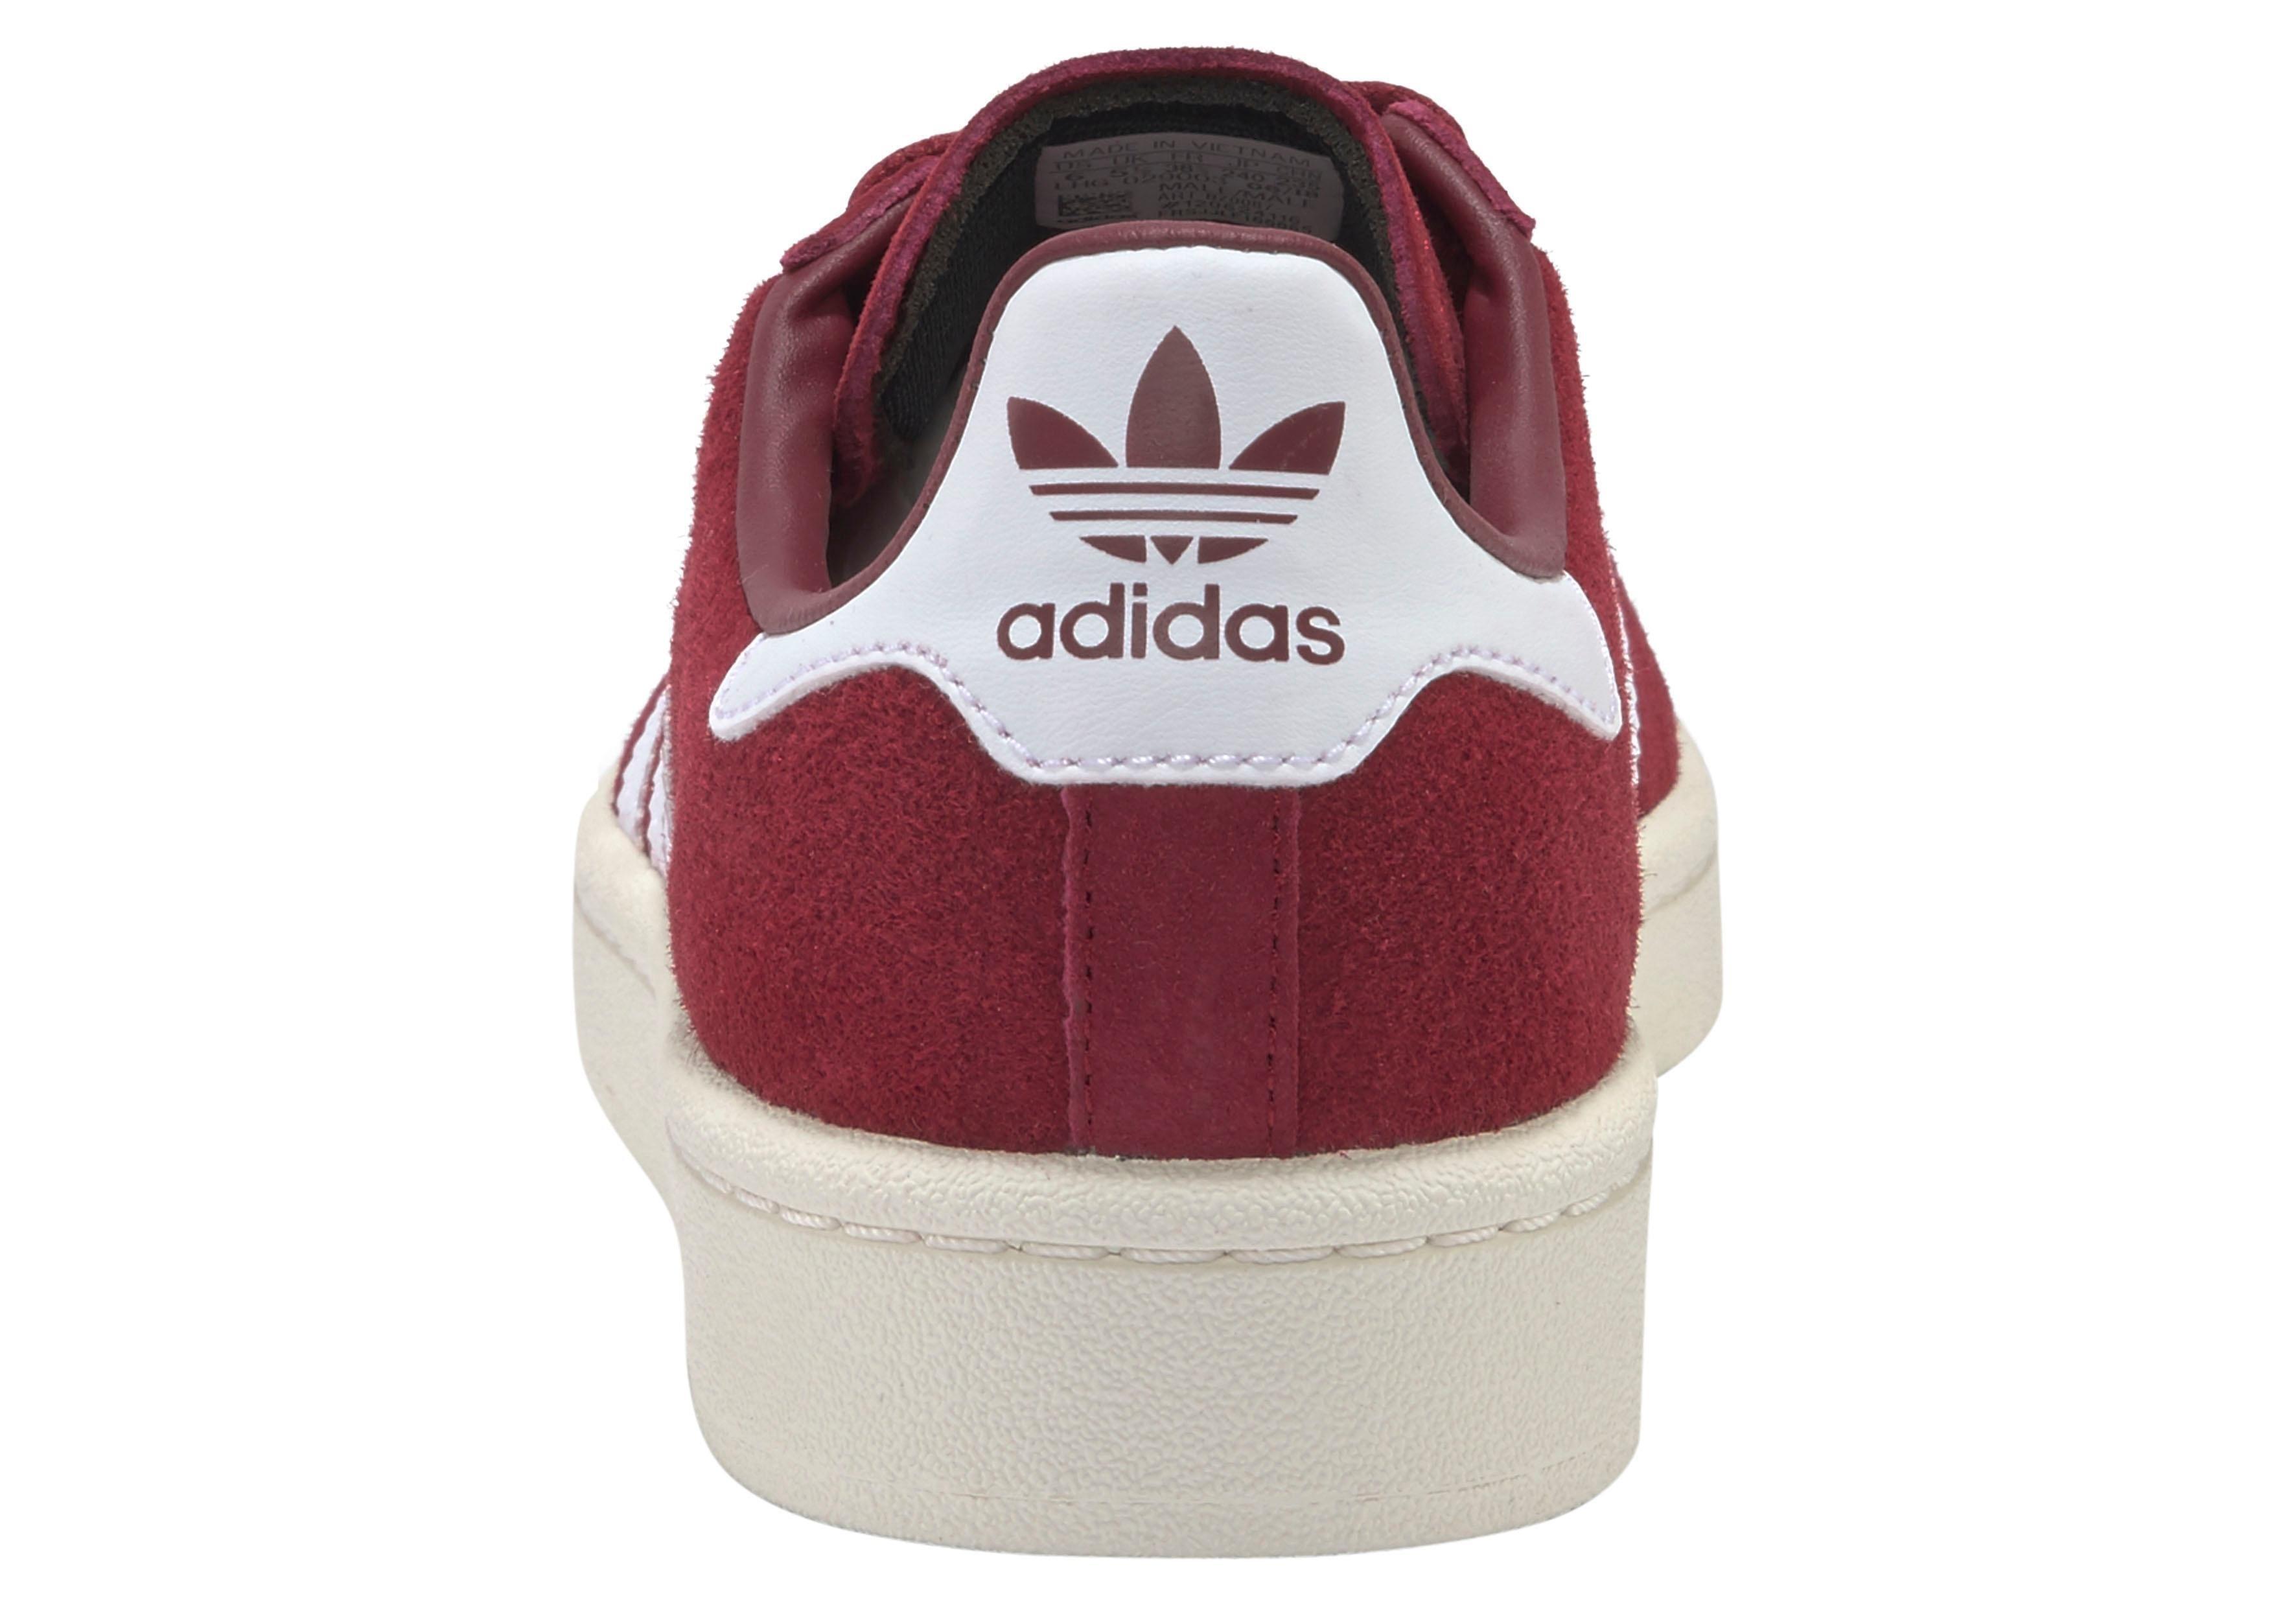 Sneakerscampus Shoppen Adidas Originals Online 0P8nwOkX